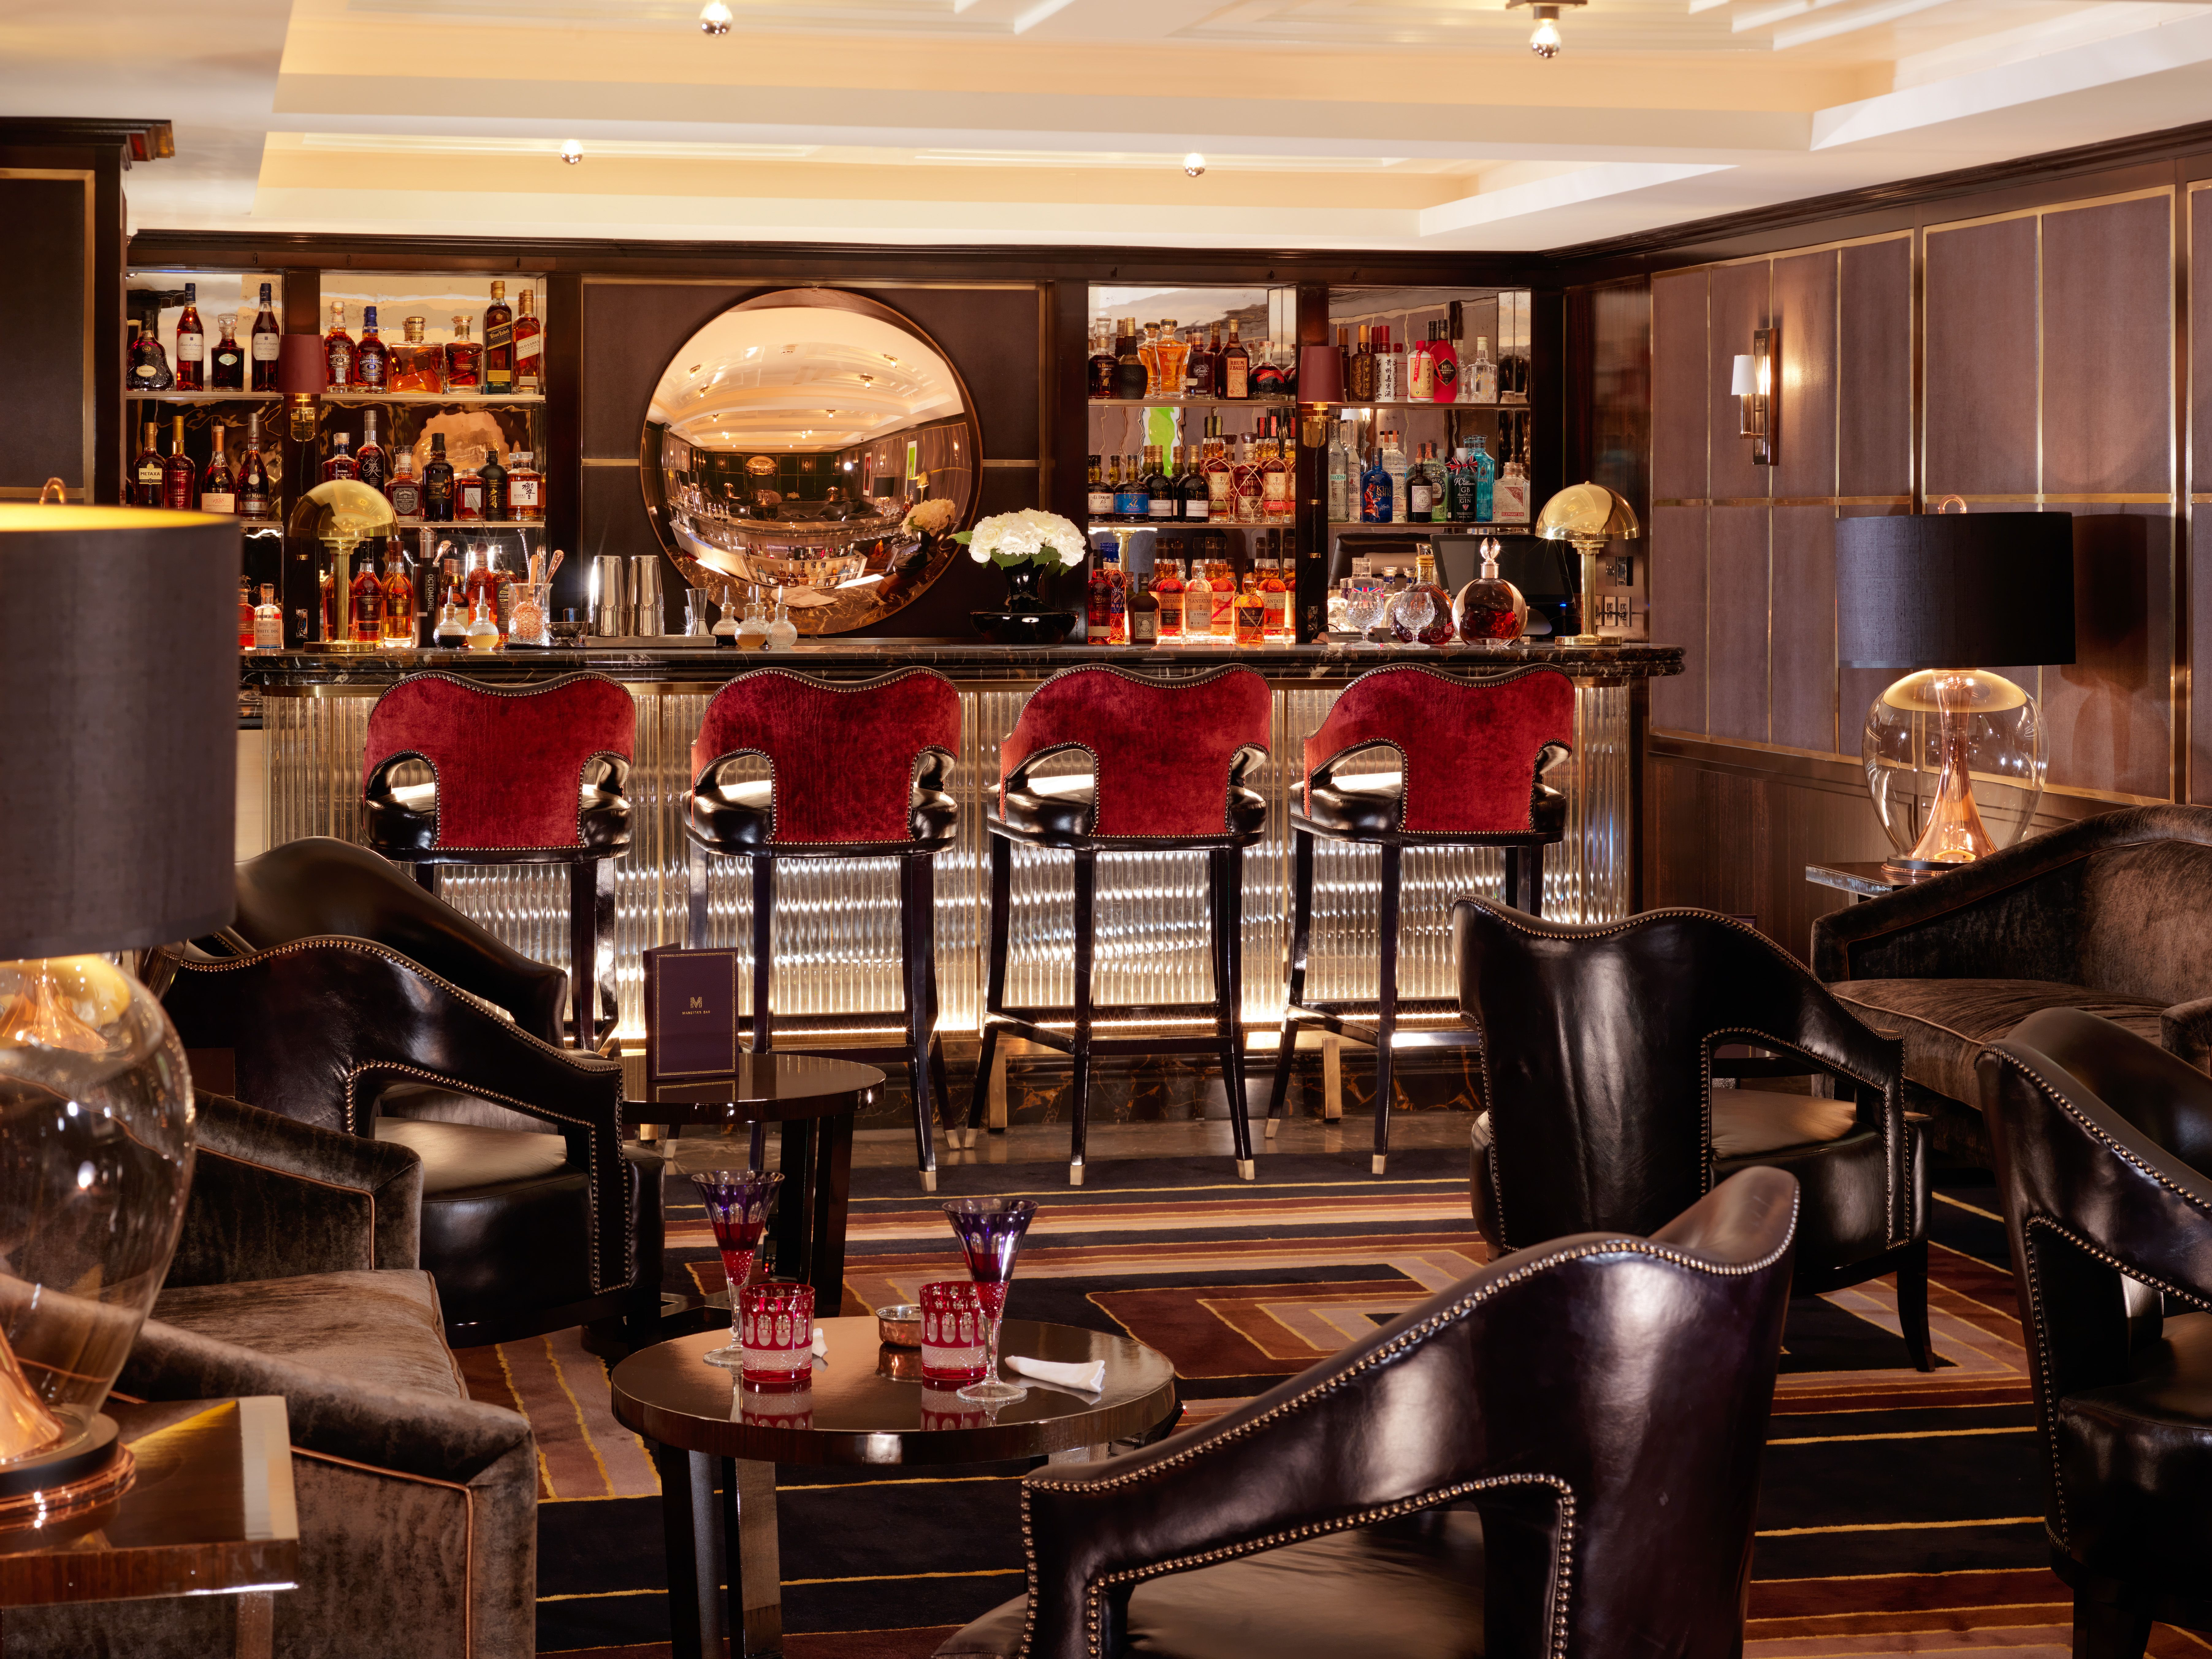 Manneta S Bar In Flemings Mayfair Hotel London Bars Cool Bars Small Luxury Hotels